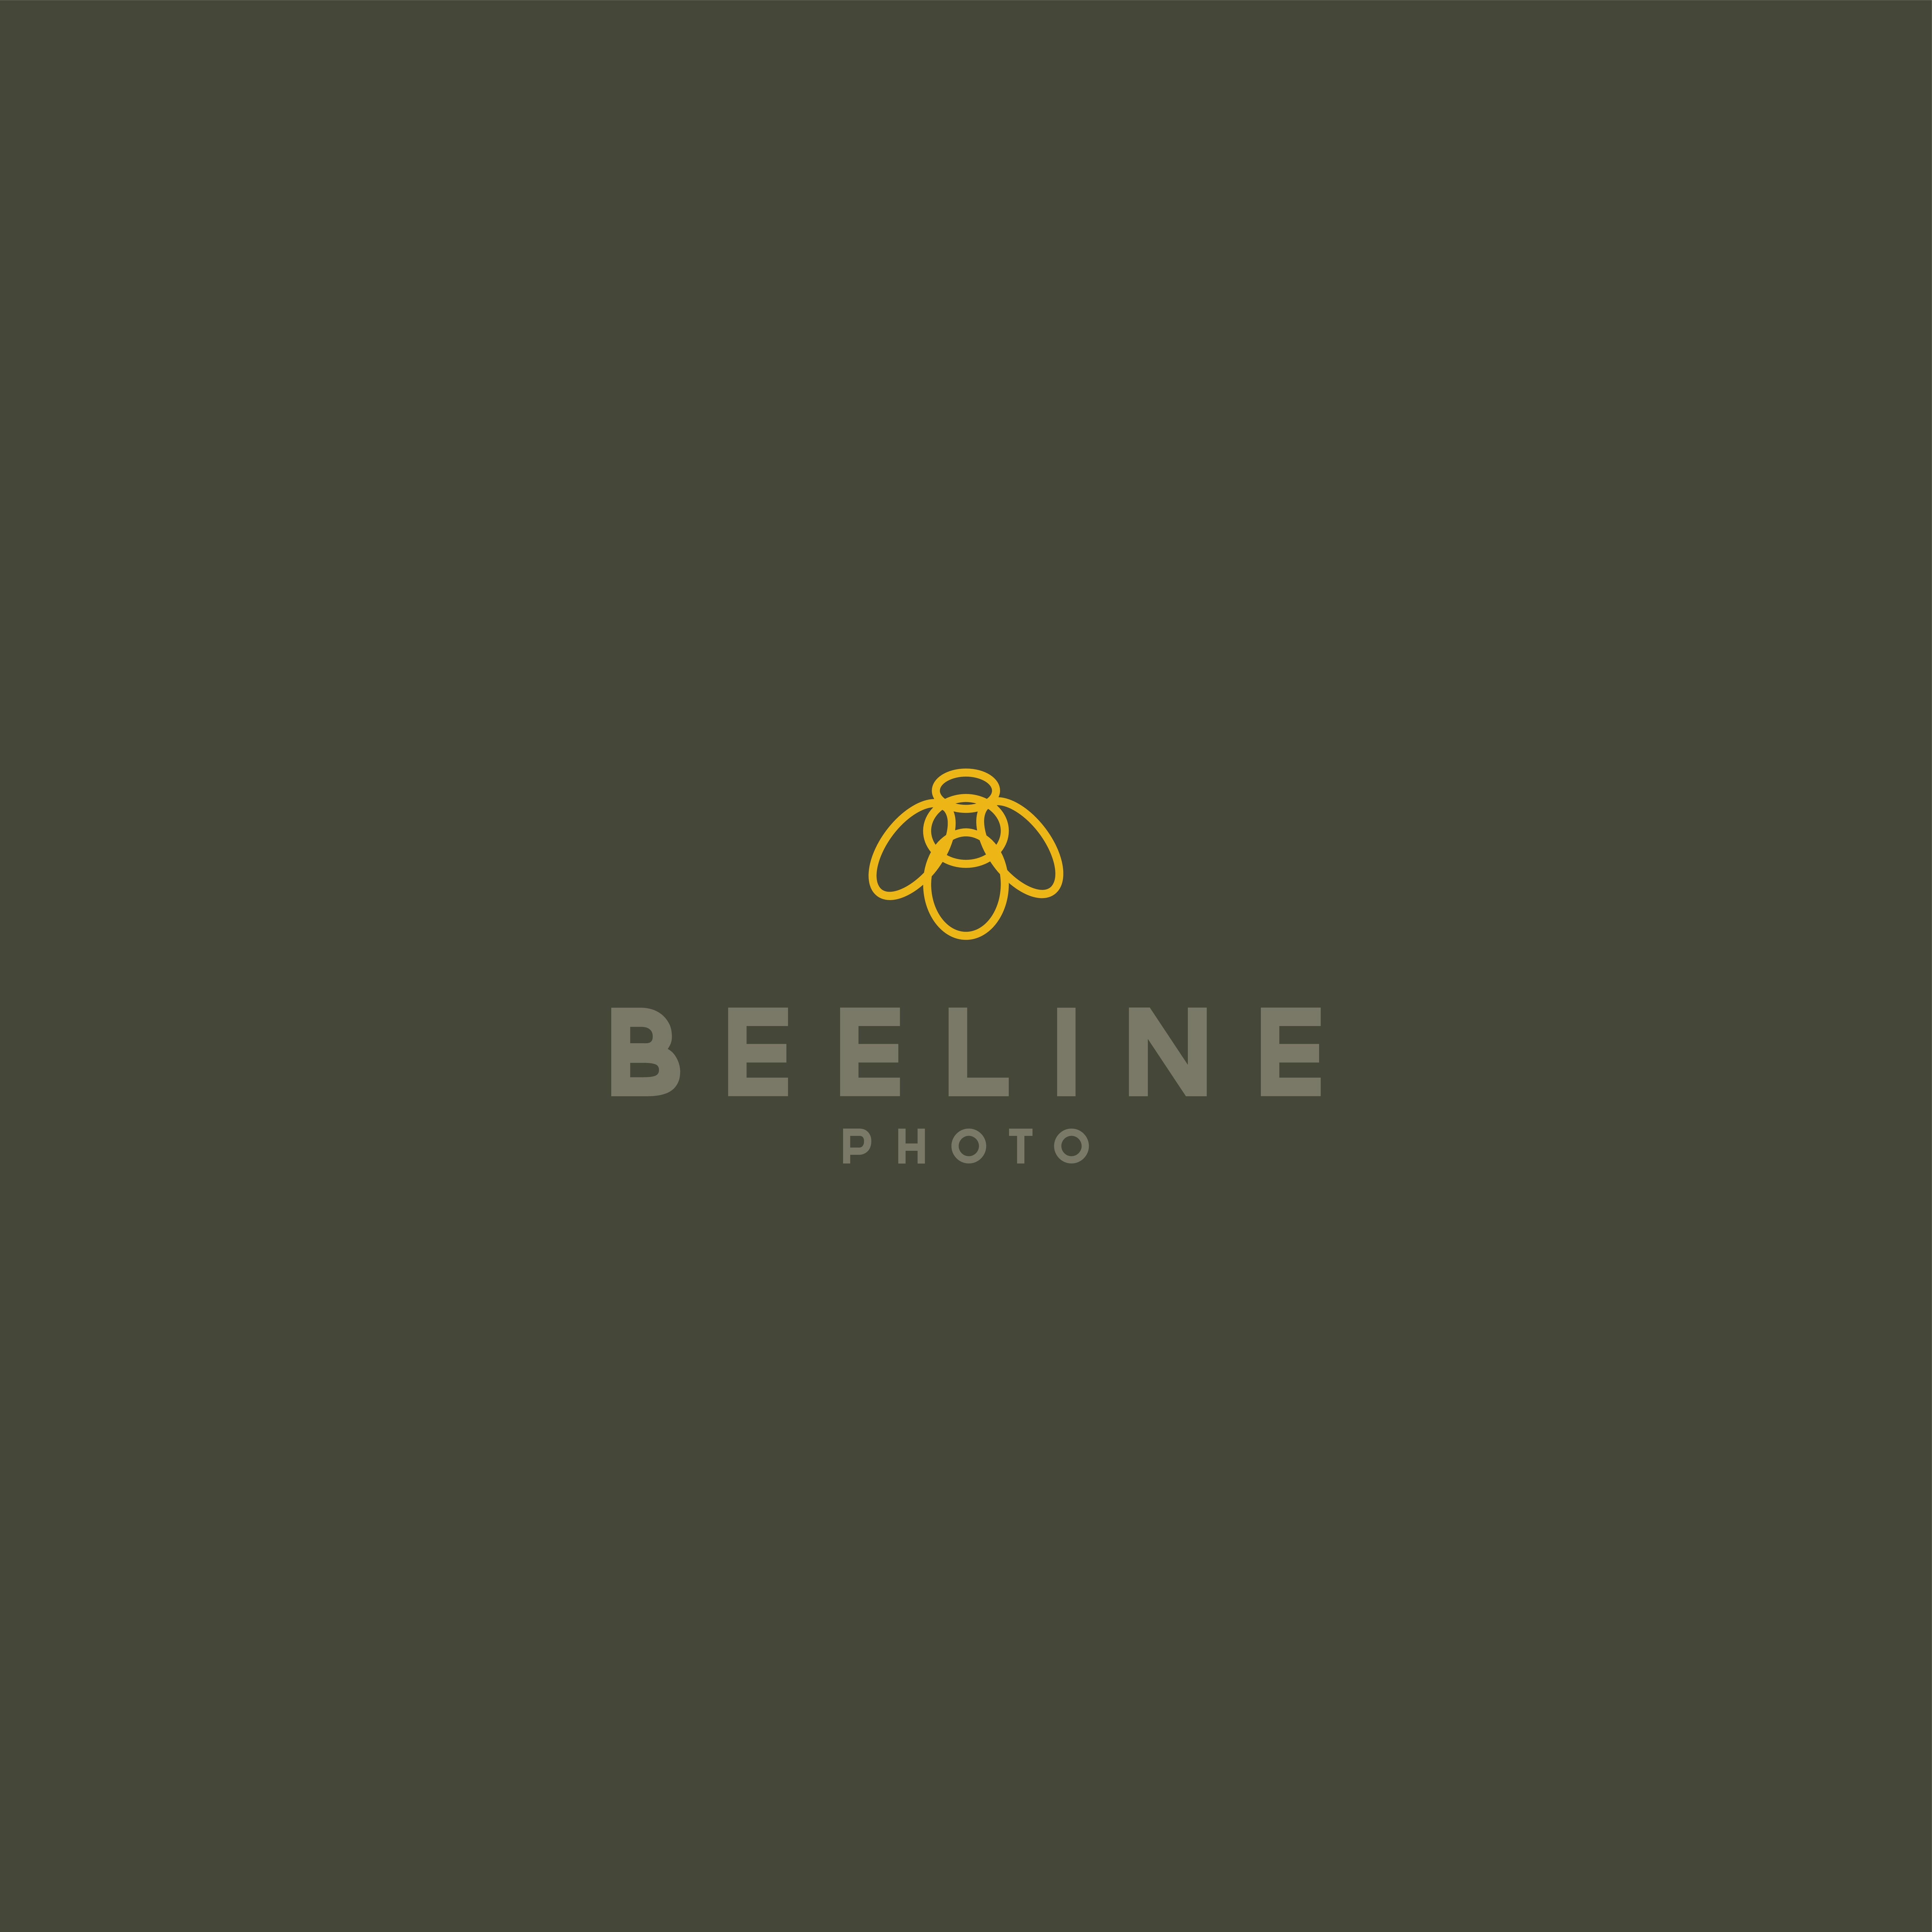 Create a high-end, modern, bold, hip, artistic logo for Beeline Photo